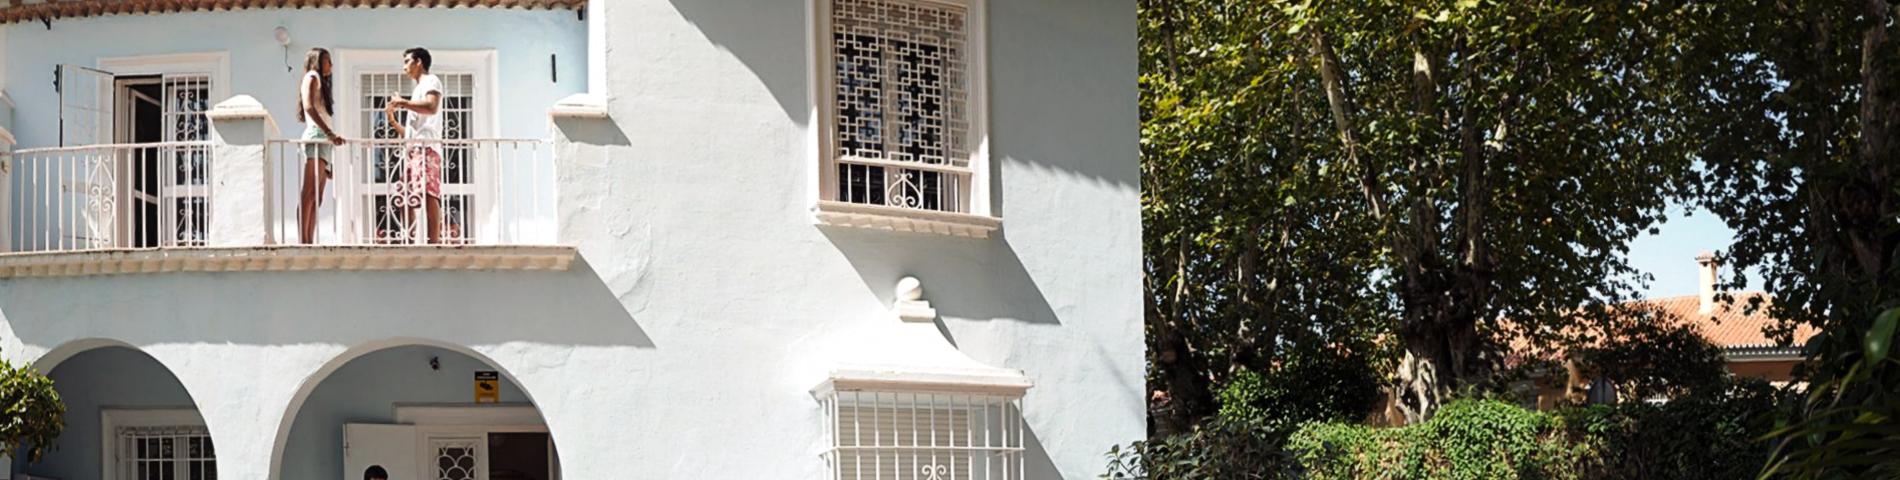 Cervantes Escuela Internacional图片1